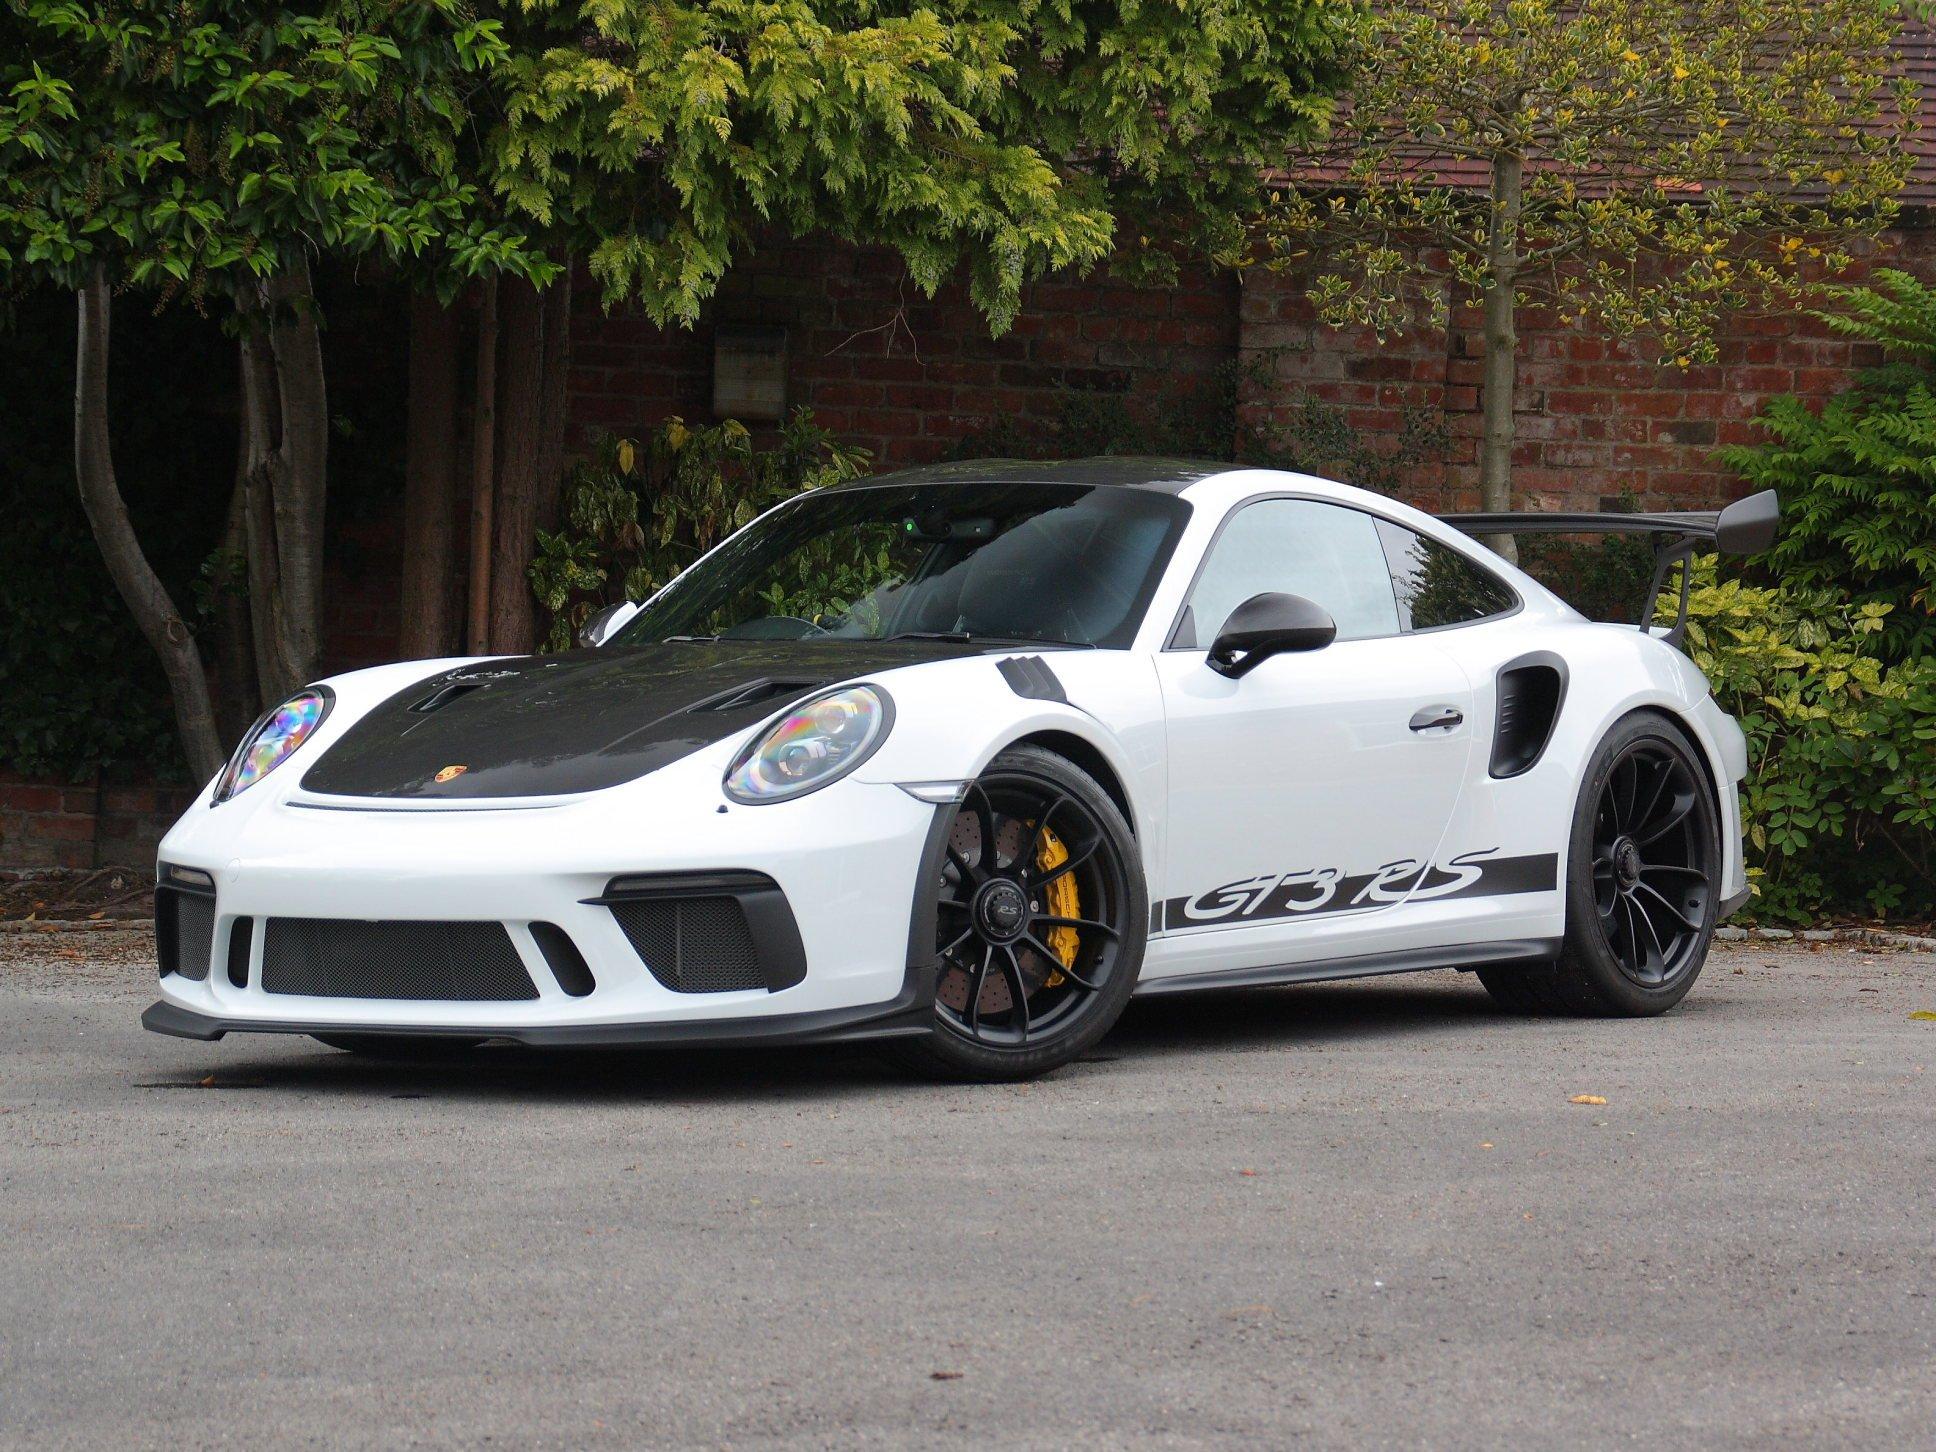 2020 Porsche 911 Gt3 911 991 2 Gt3 Rs Classic Driver Market